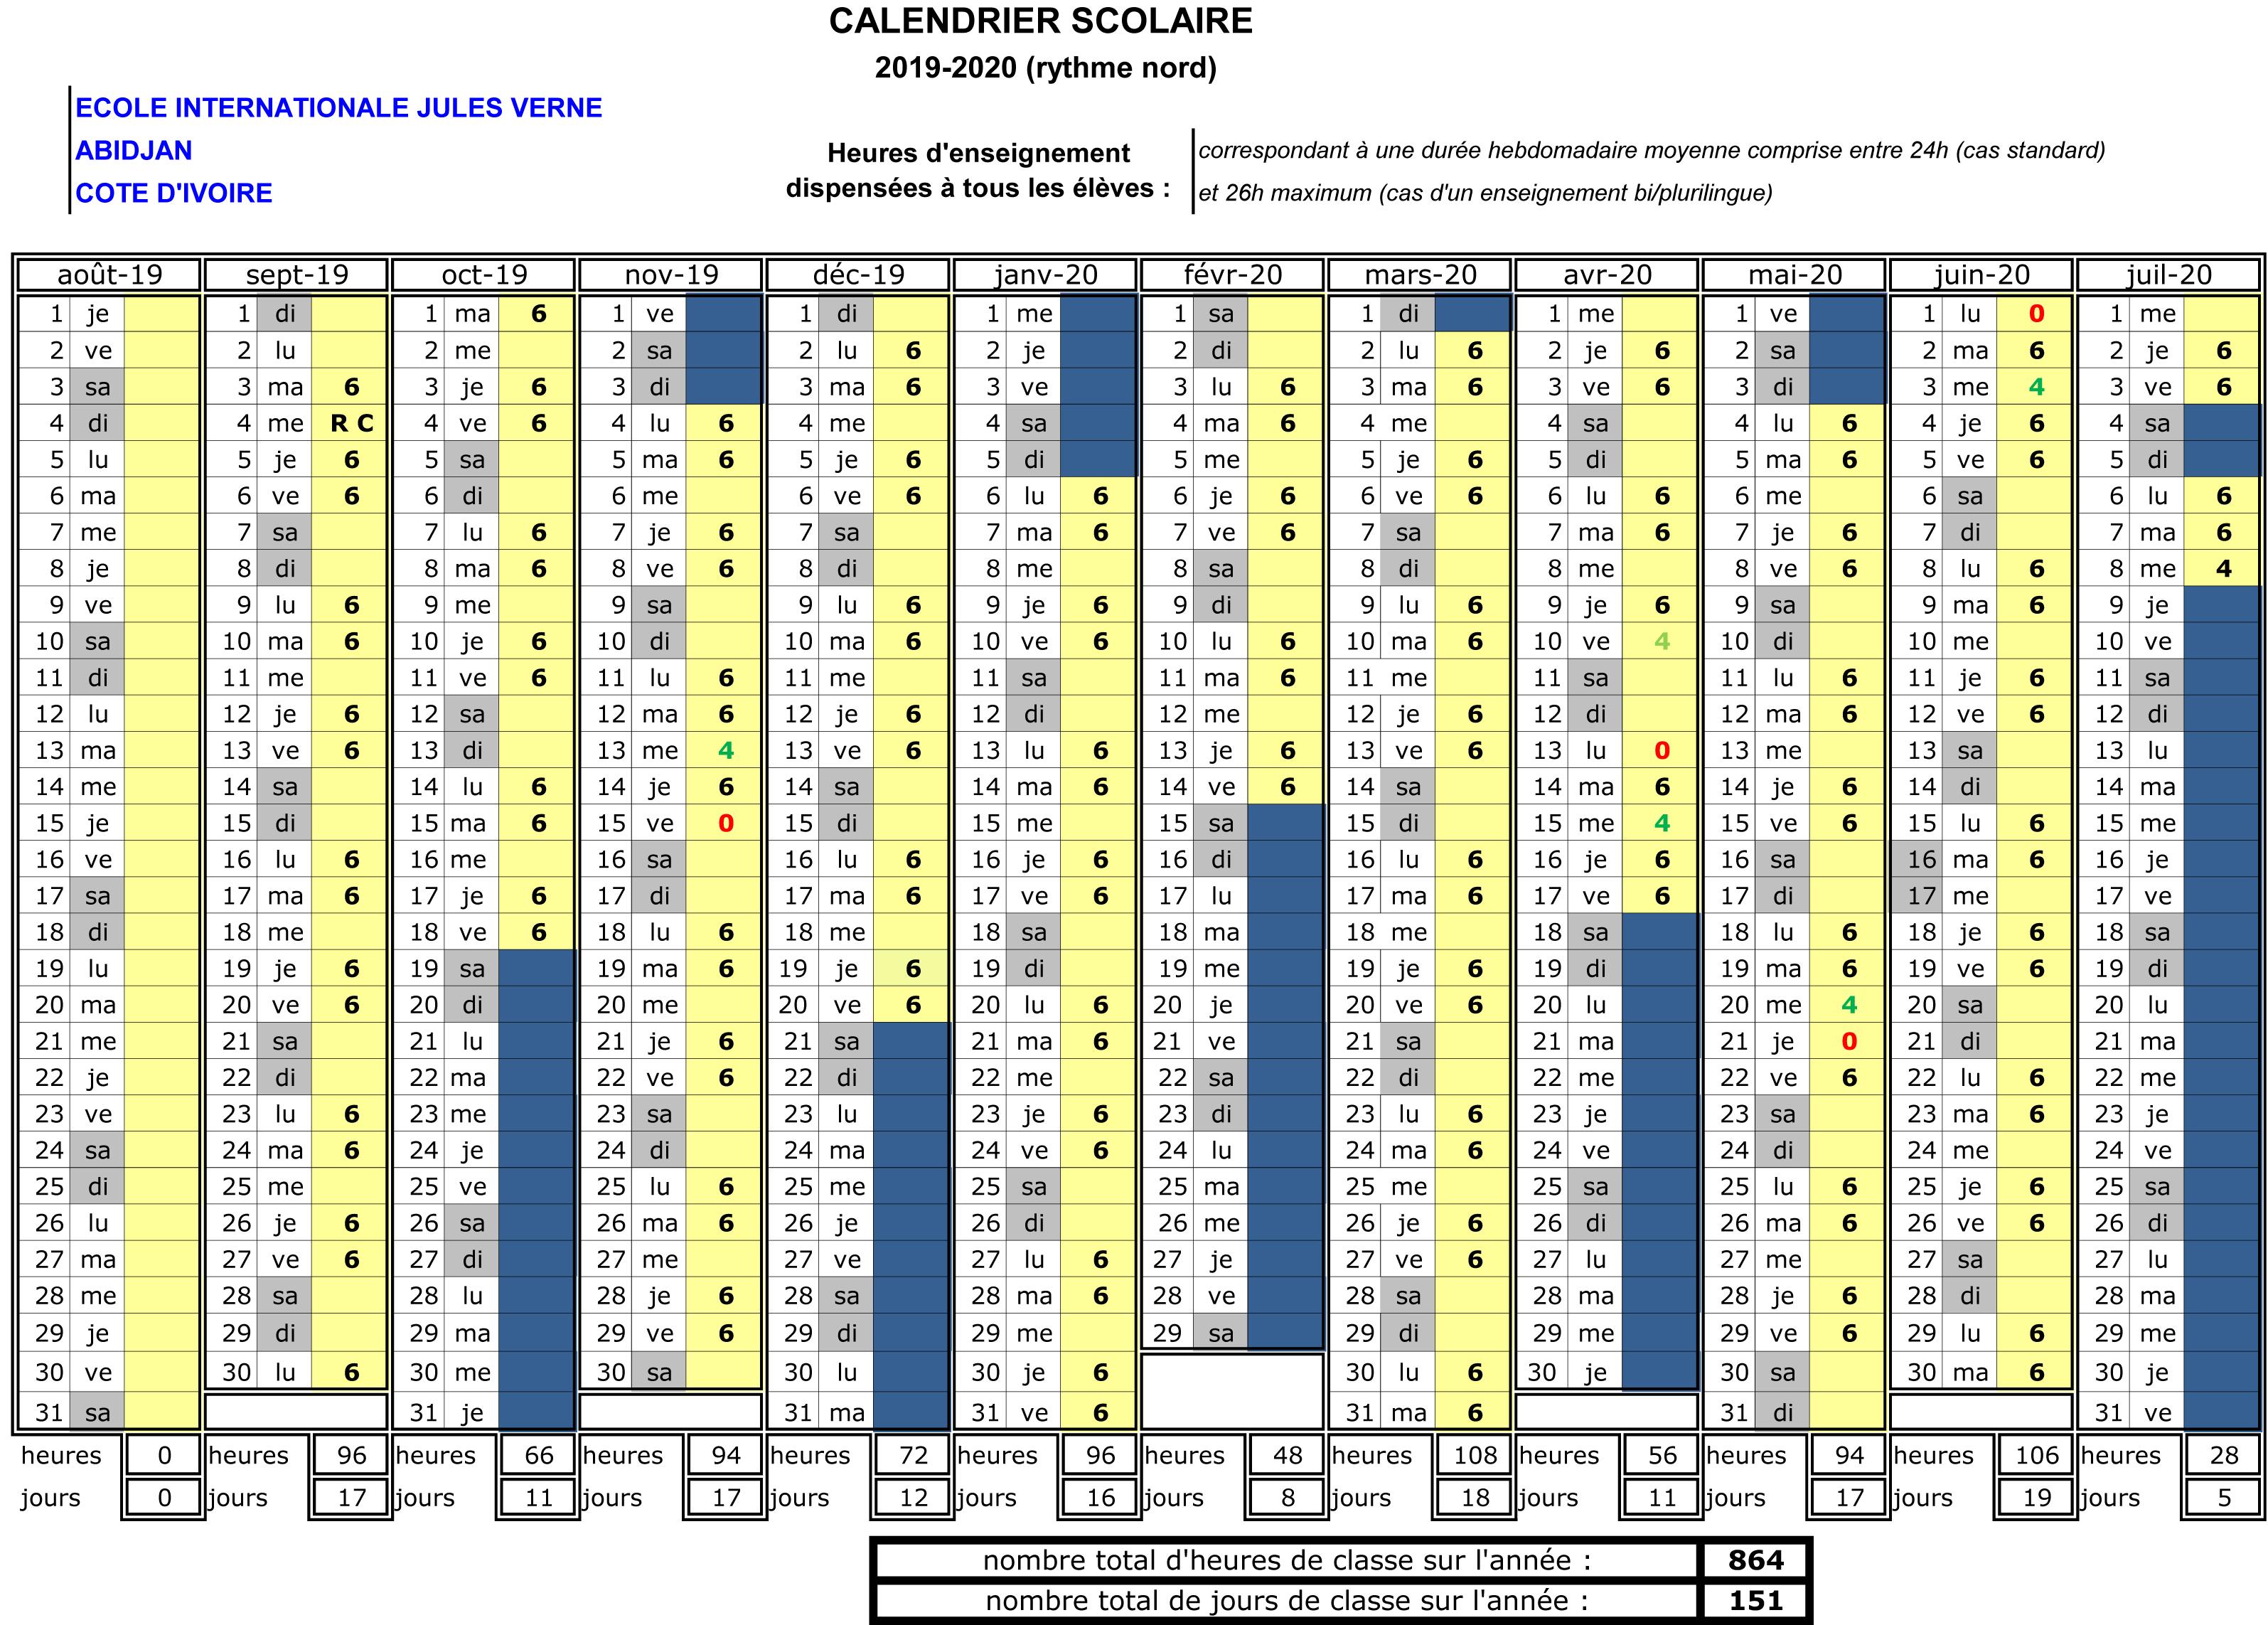 Calendrier Pedagogique.Informations Generales Ecole Internationale Jules Verne D